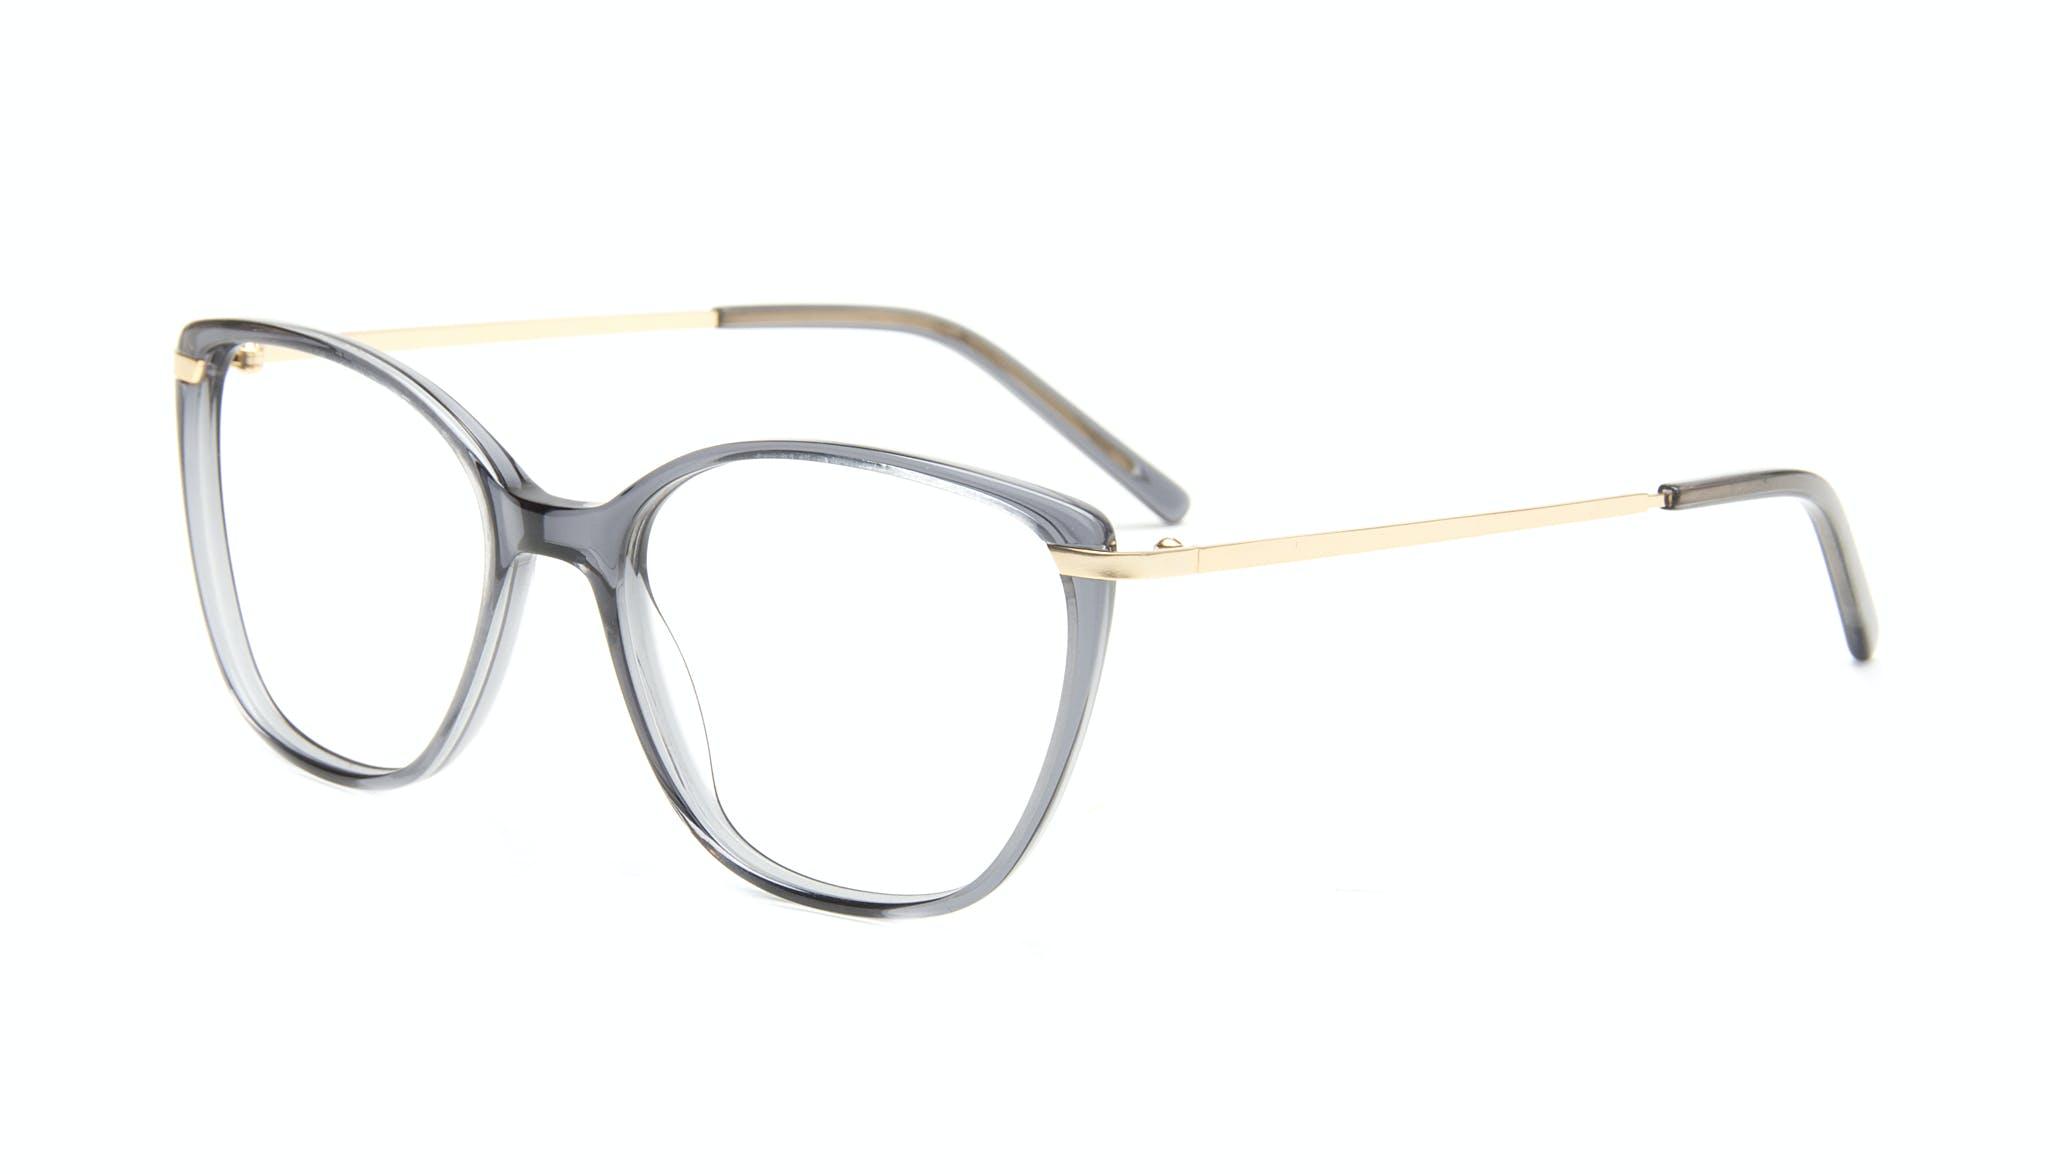 Affordable Fashion Glasses Cat Eye Rectangle Square Eyeglasses Women Illusion Gold Shadow Tilt